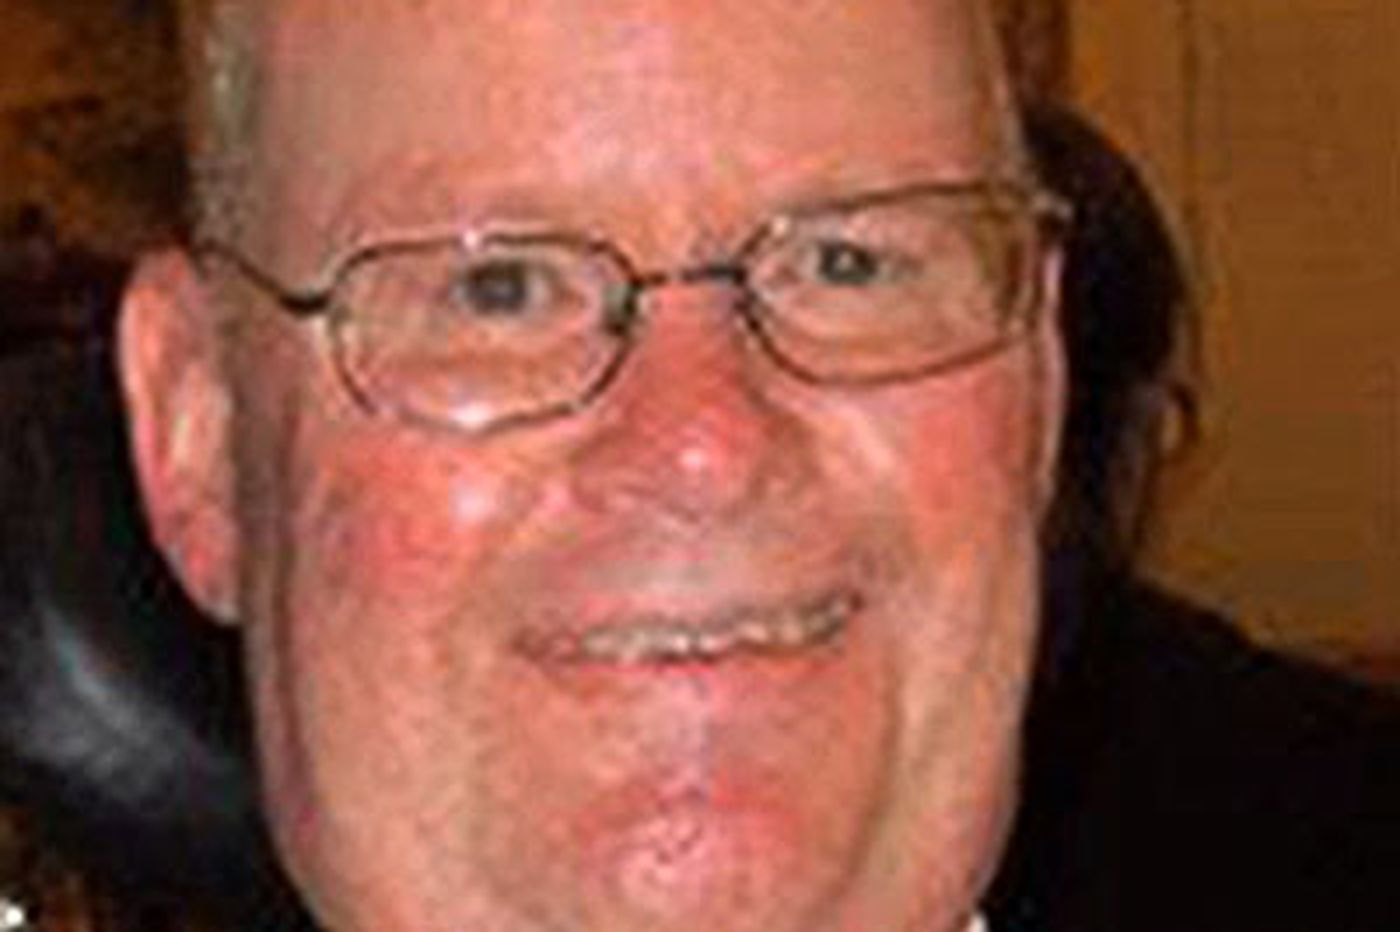 James W. Staerk, 54, Montco prosecutor